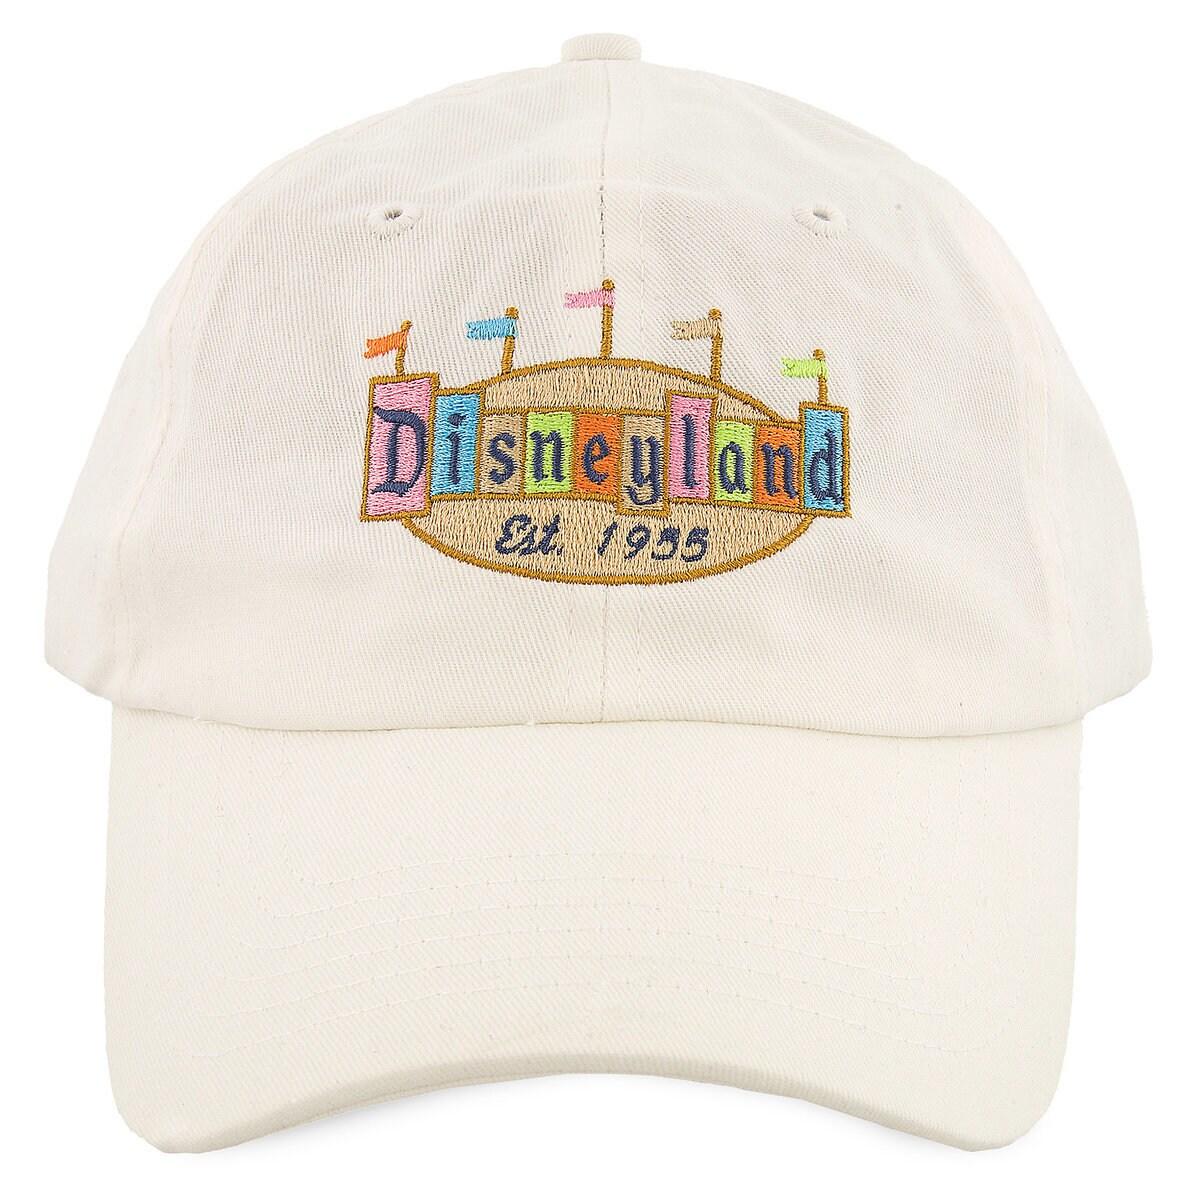 d87ba0dae696ce Product Image of Disneyland Retro Baseball Cap for Adults # 1